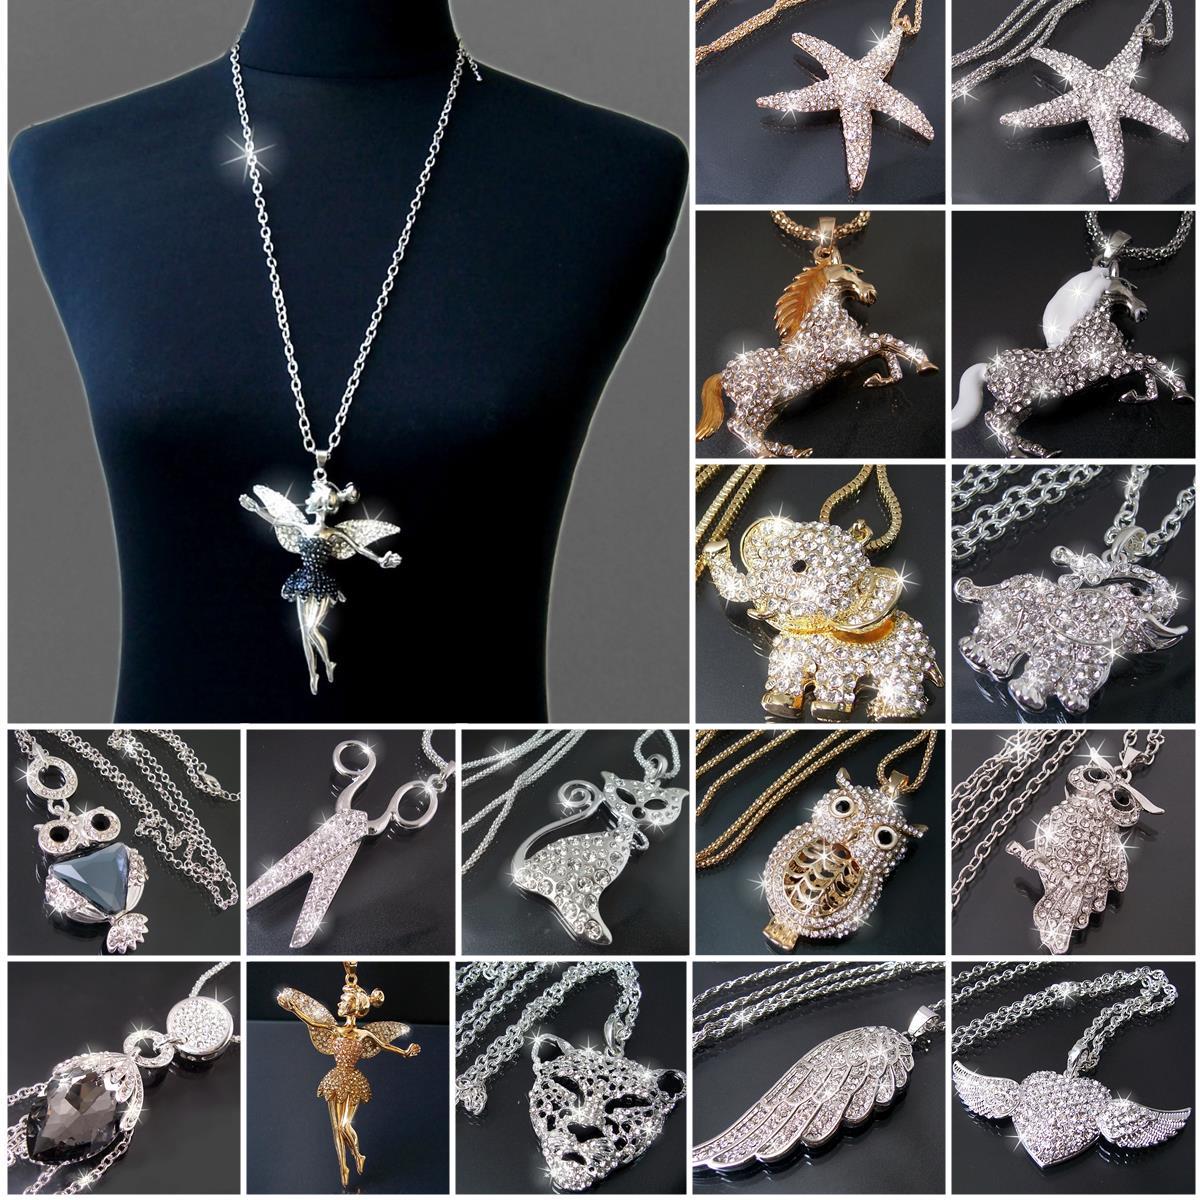 Modeschmuck kette silber  Lange Kette Halskette Flügel Engelsflügel Eule Strass Silber Gold ...